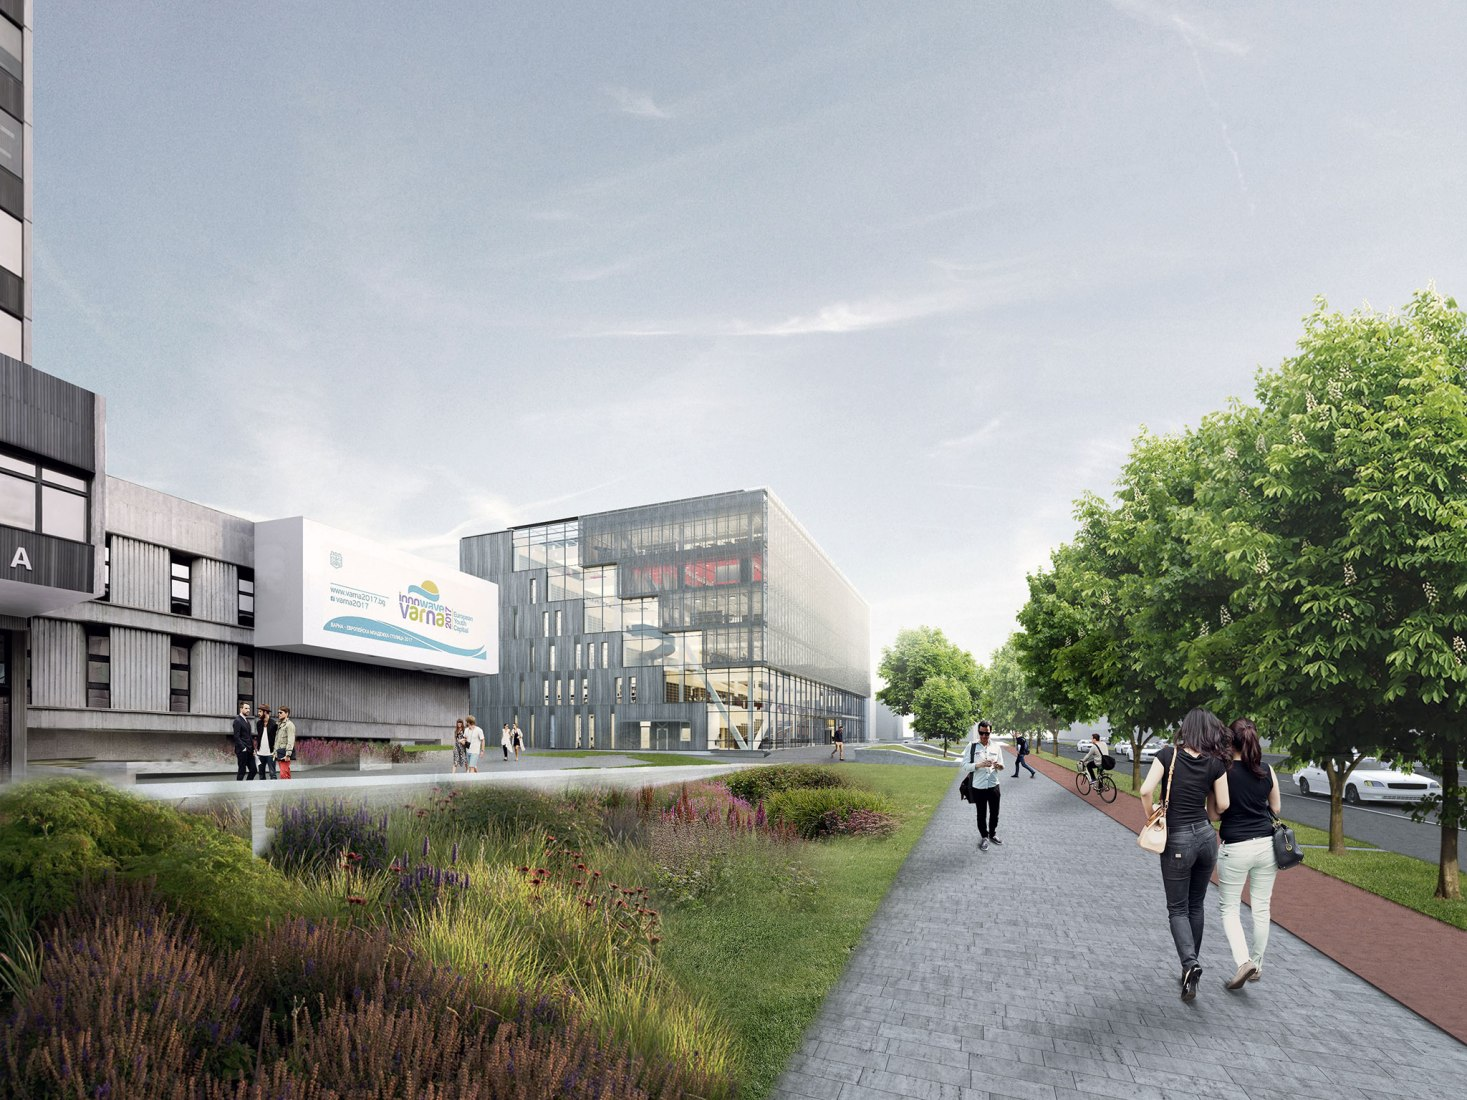 Render vista exterior oeste. La Biblioteca Regional de Varna por Architects for Urbanity